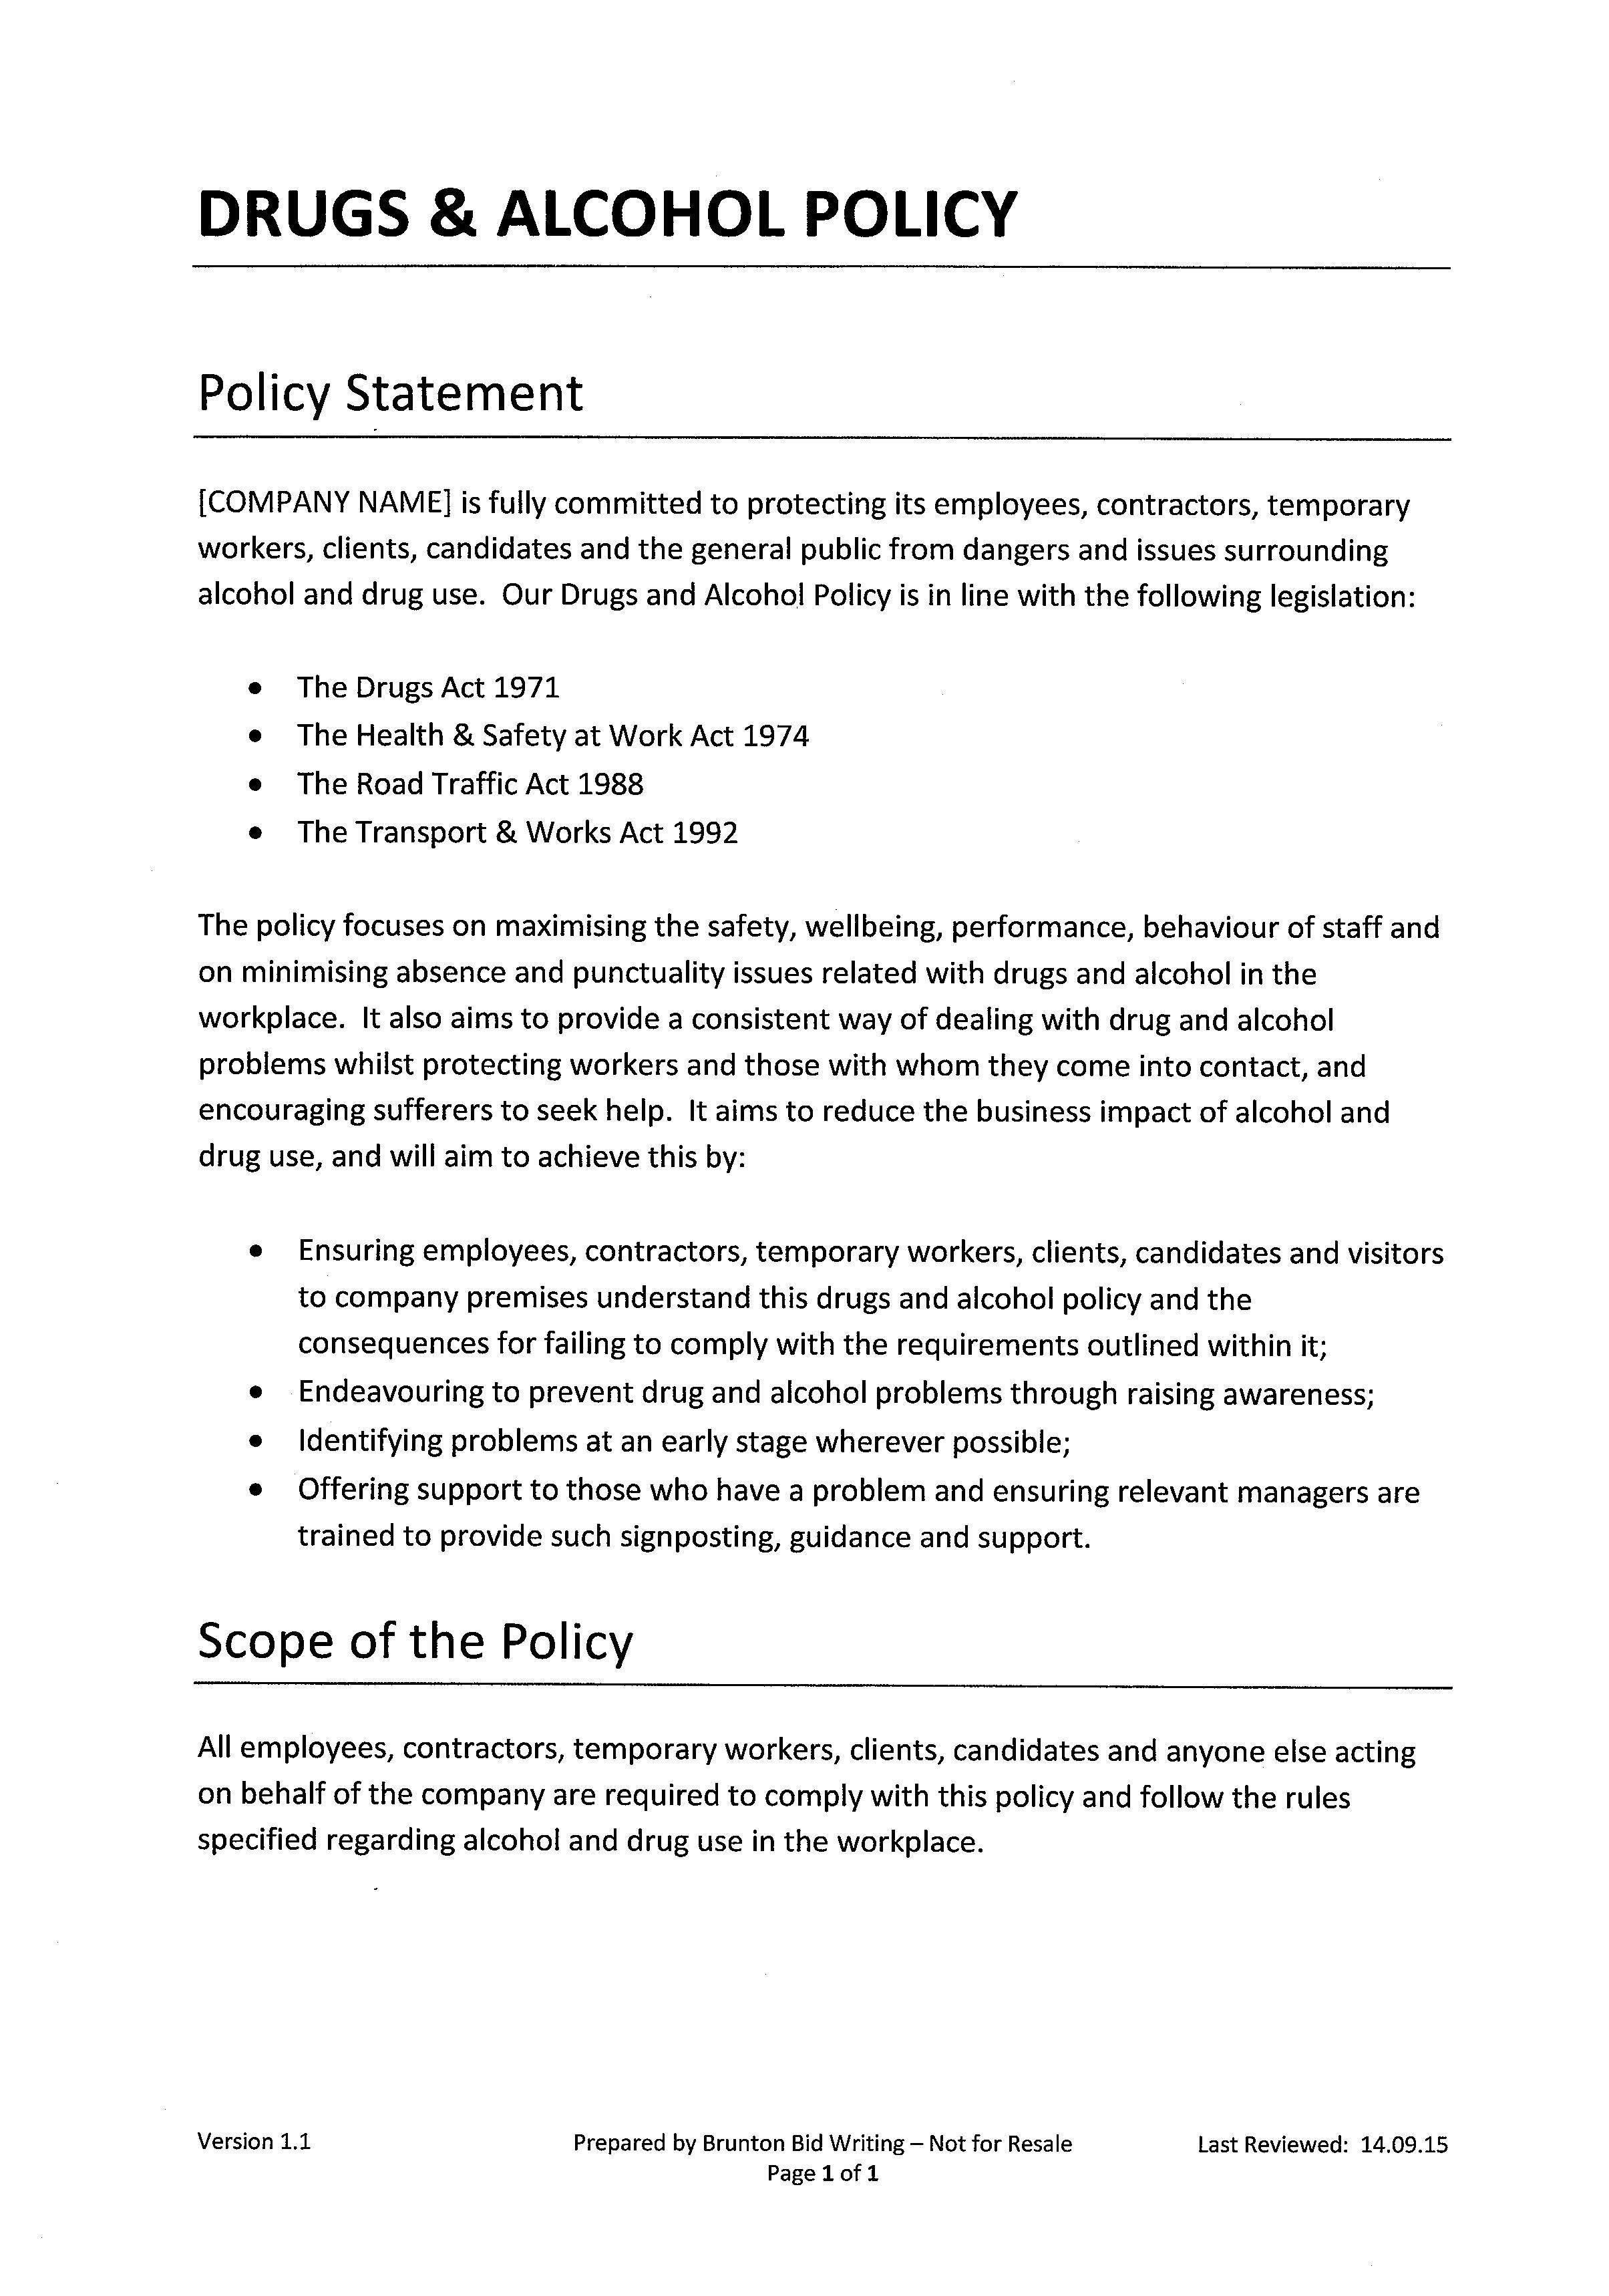 Drugs & alcohol policy brunton bid writing.